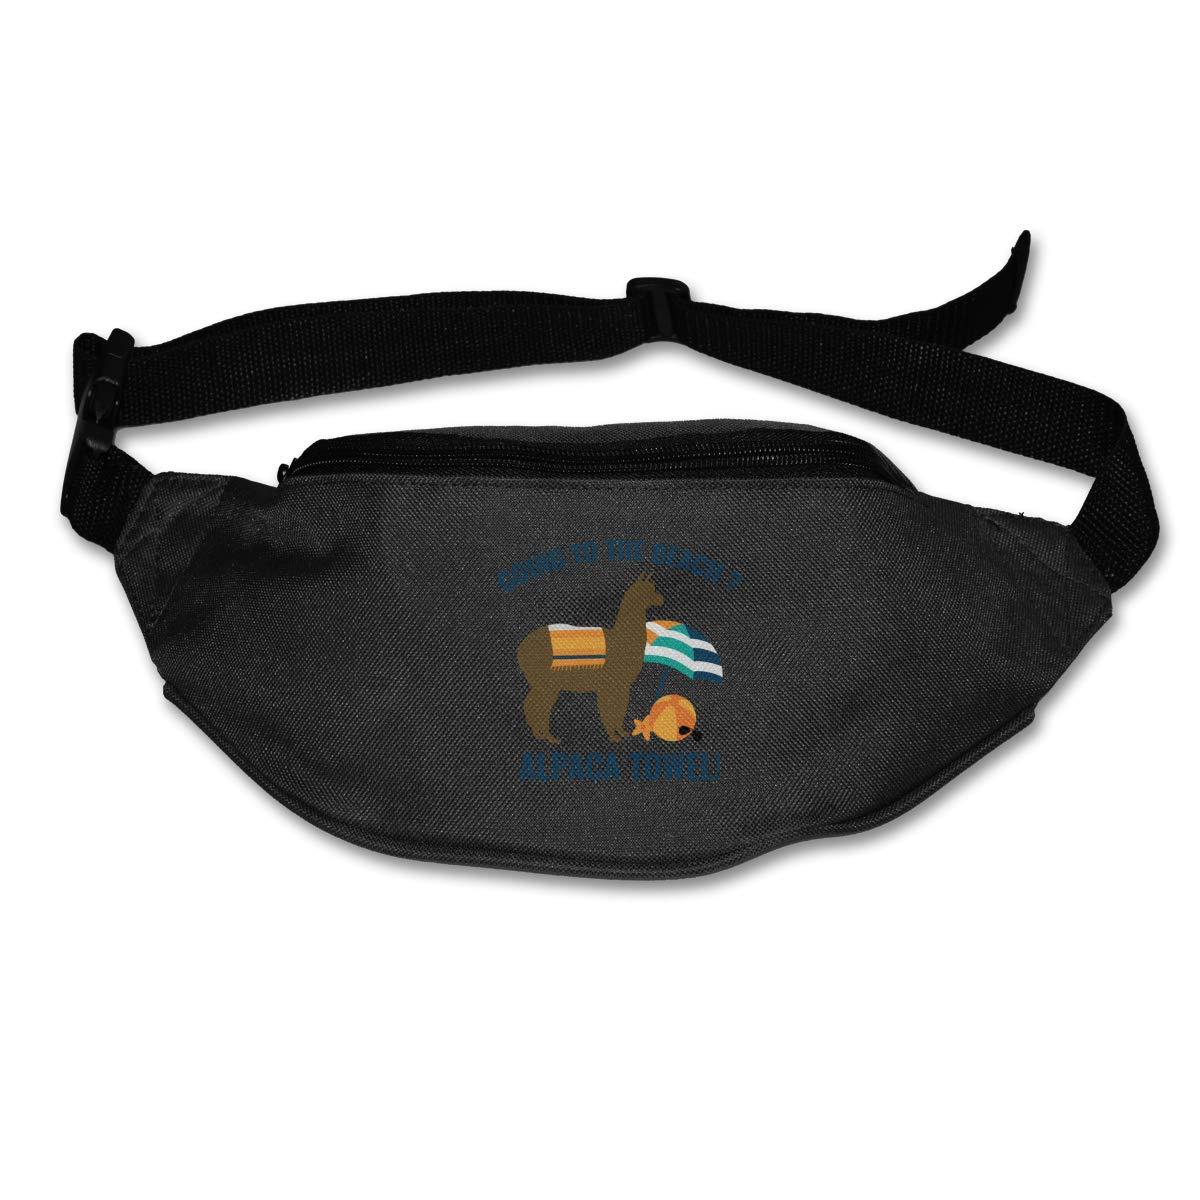 Going To The Beach Alpaca Towel Bag Waist Packs Fanny Pack Adjustable For Run